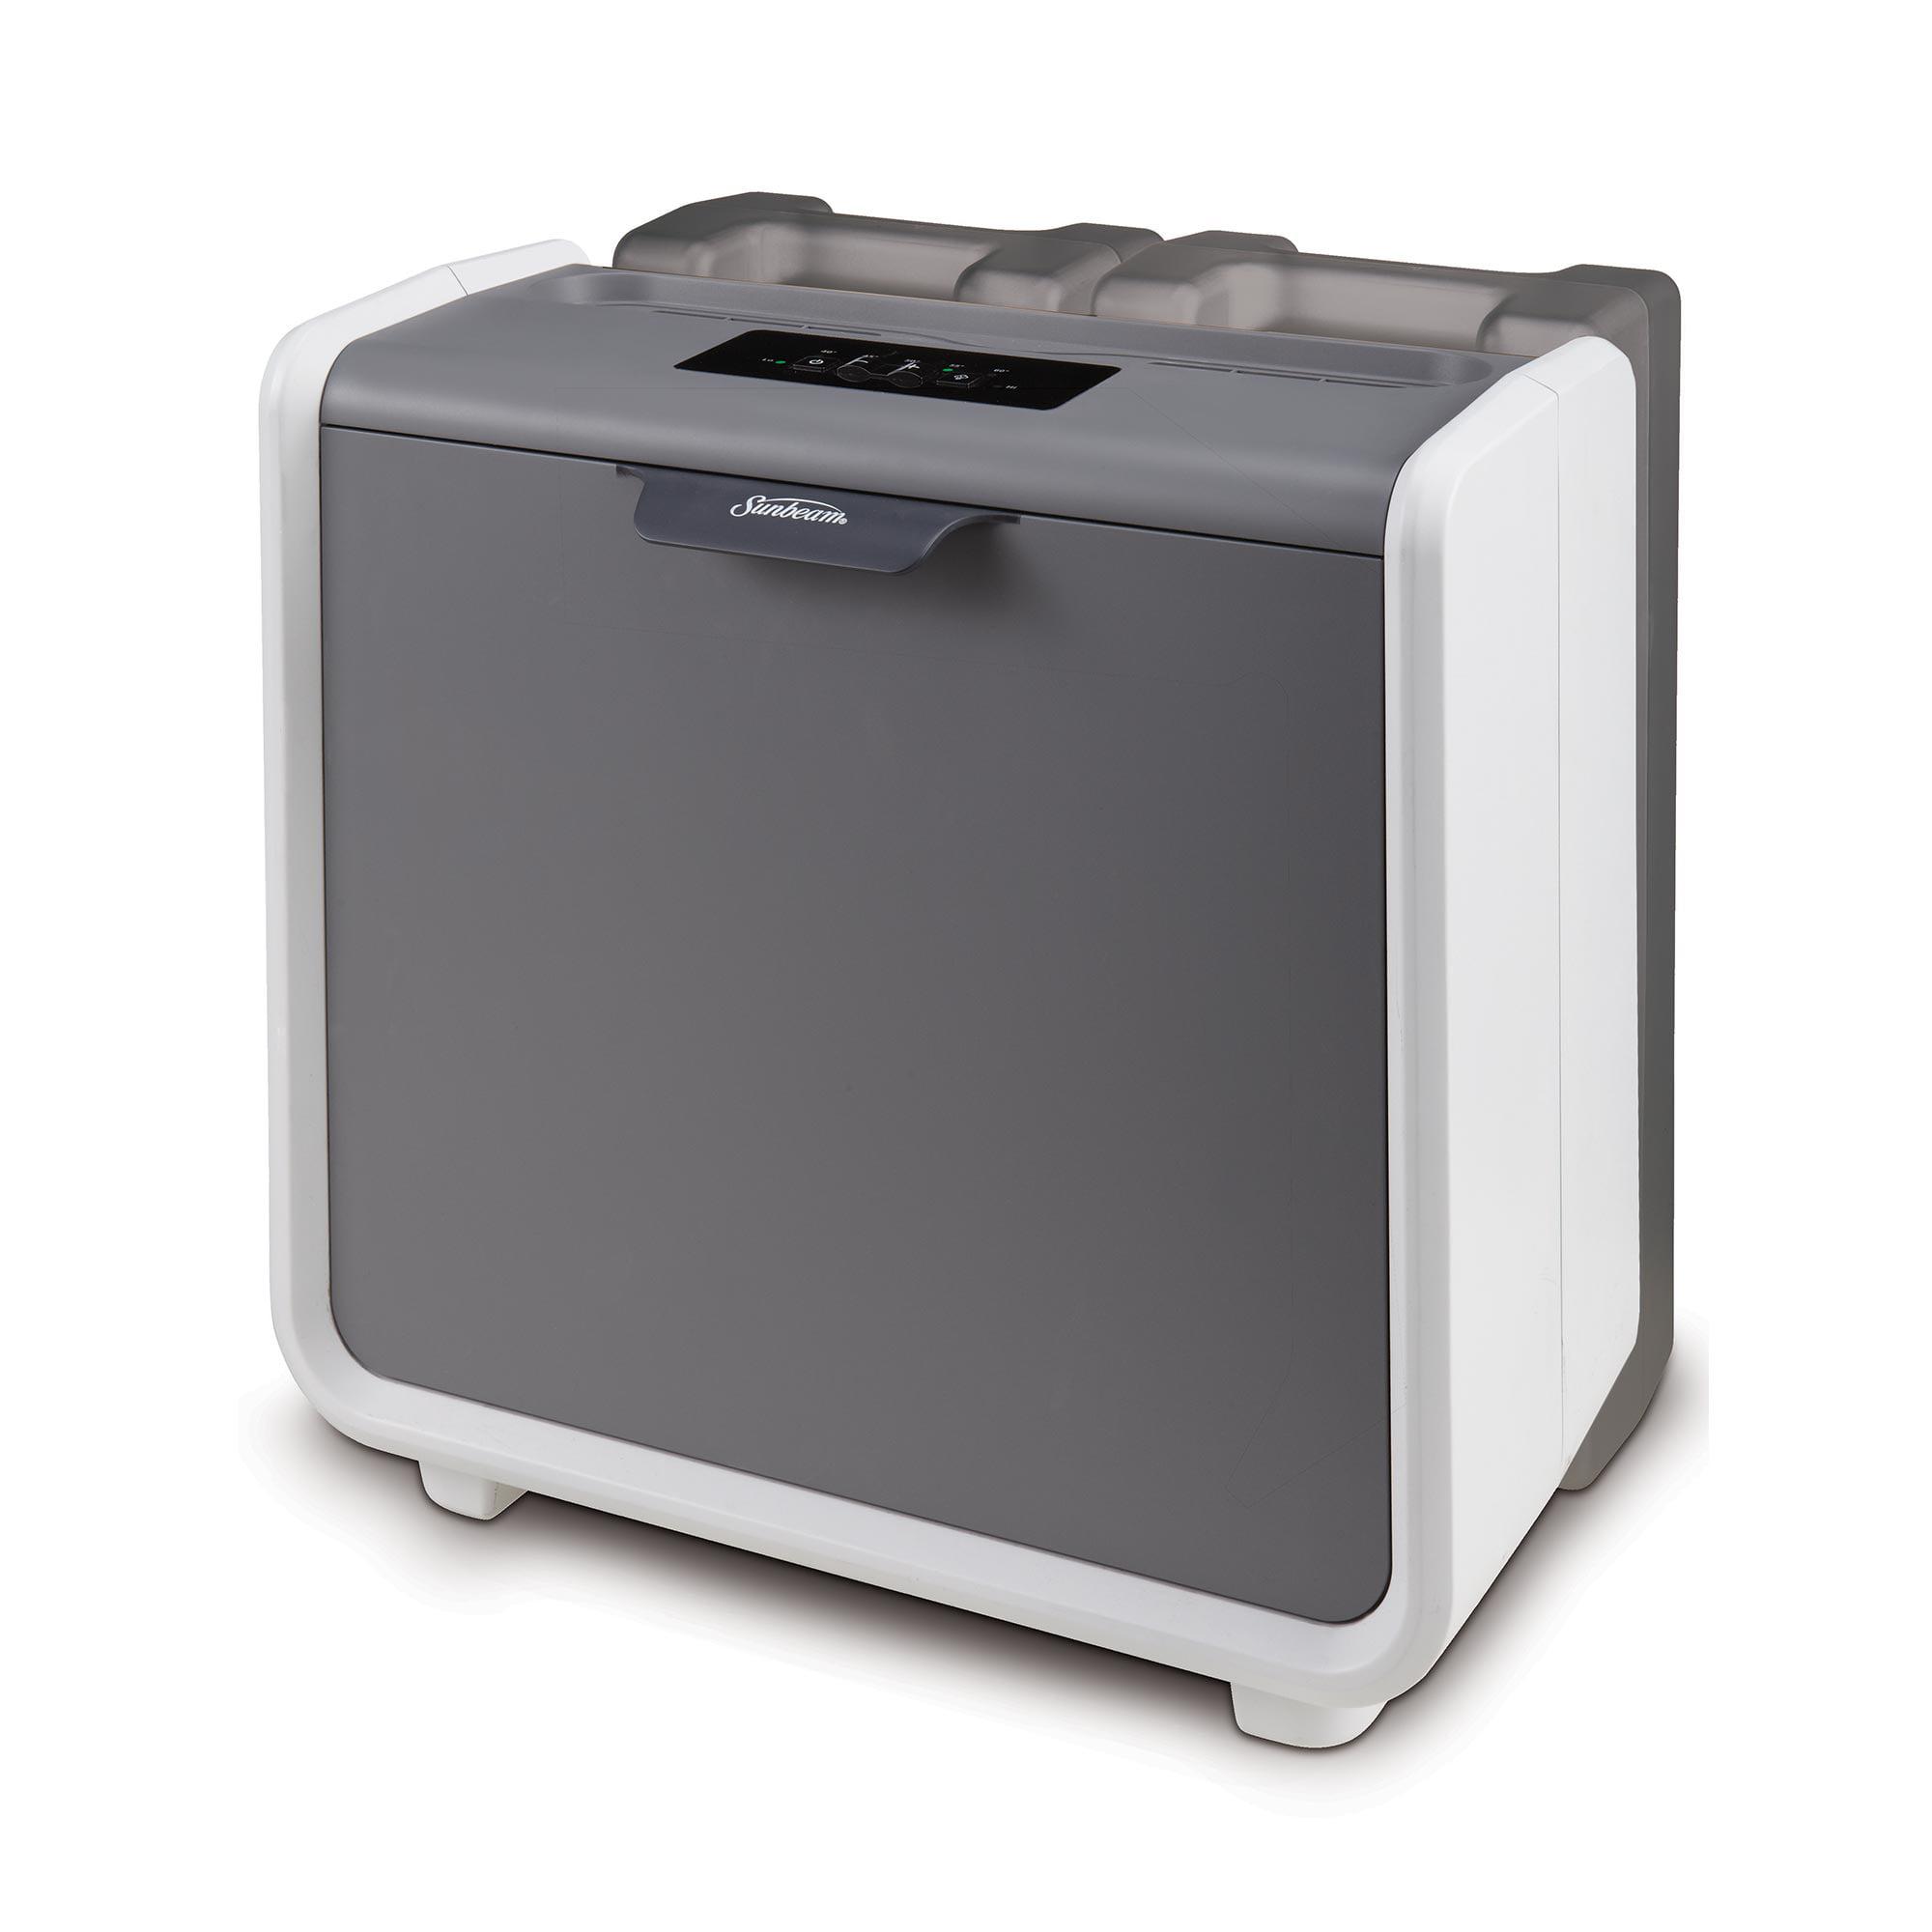 Walmart Humidifier No Filter sunbeam cool mist humidifier (scm3755c-bwm) - walmart